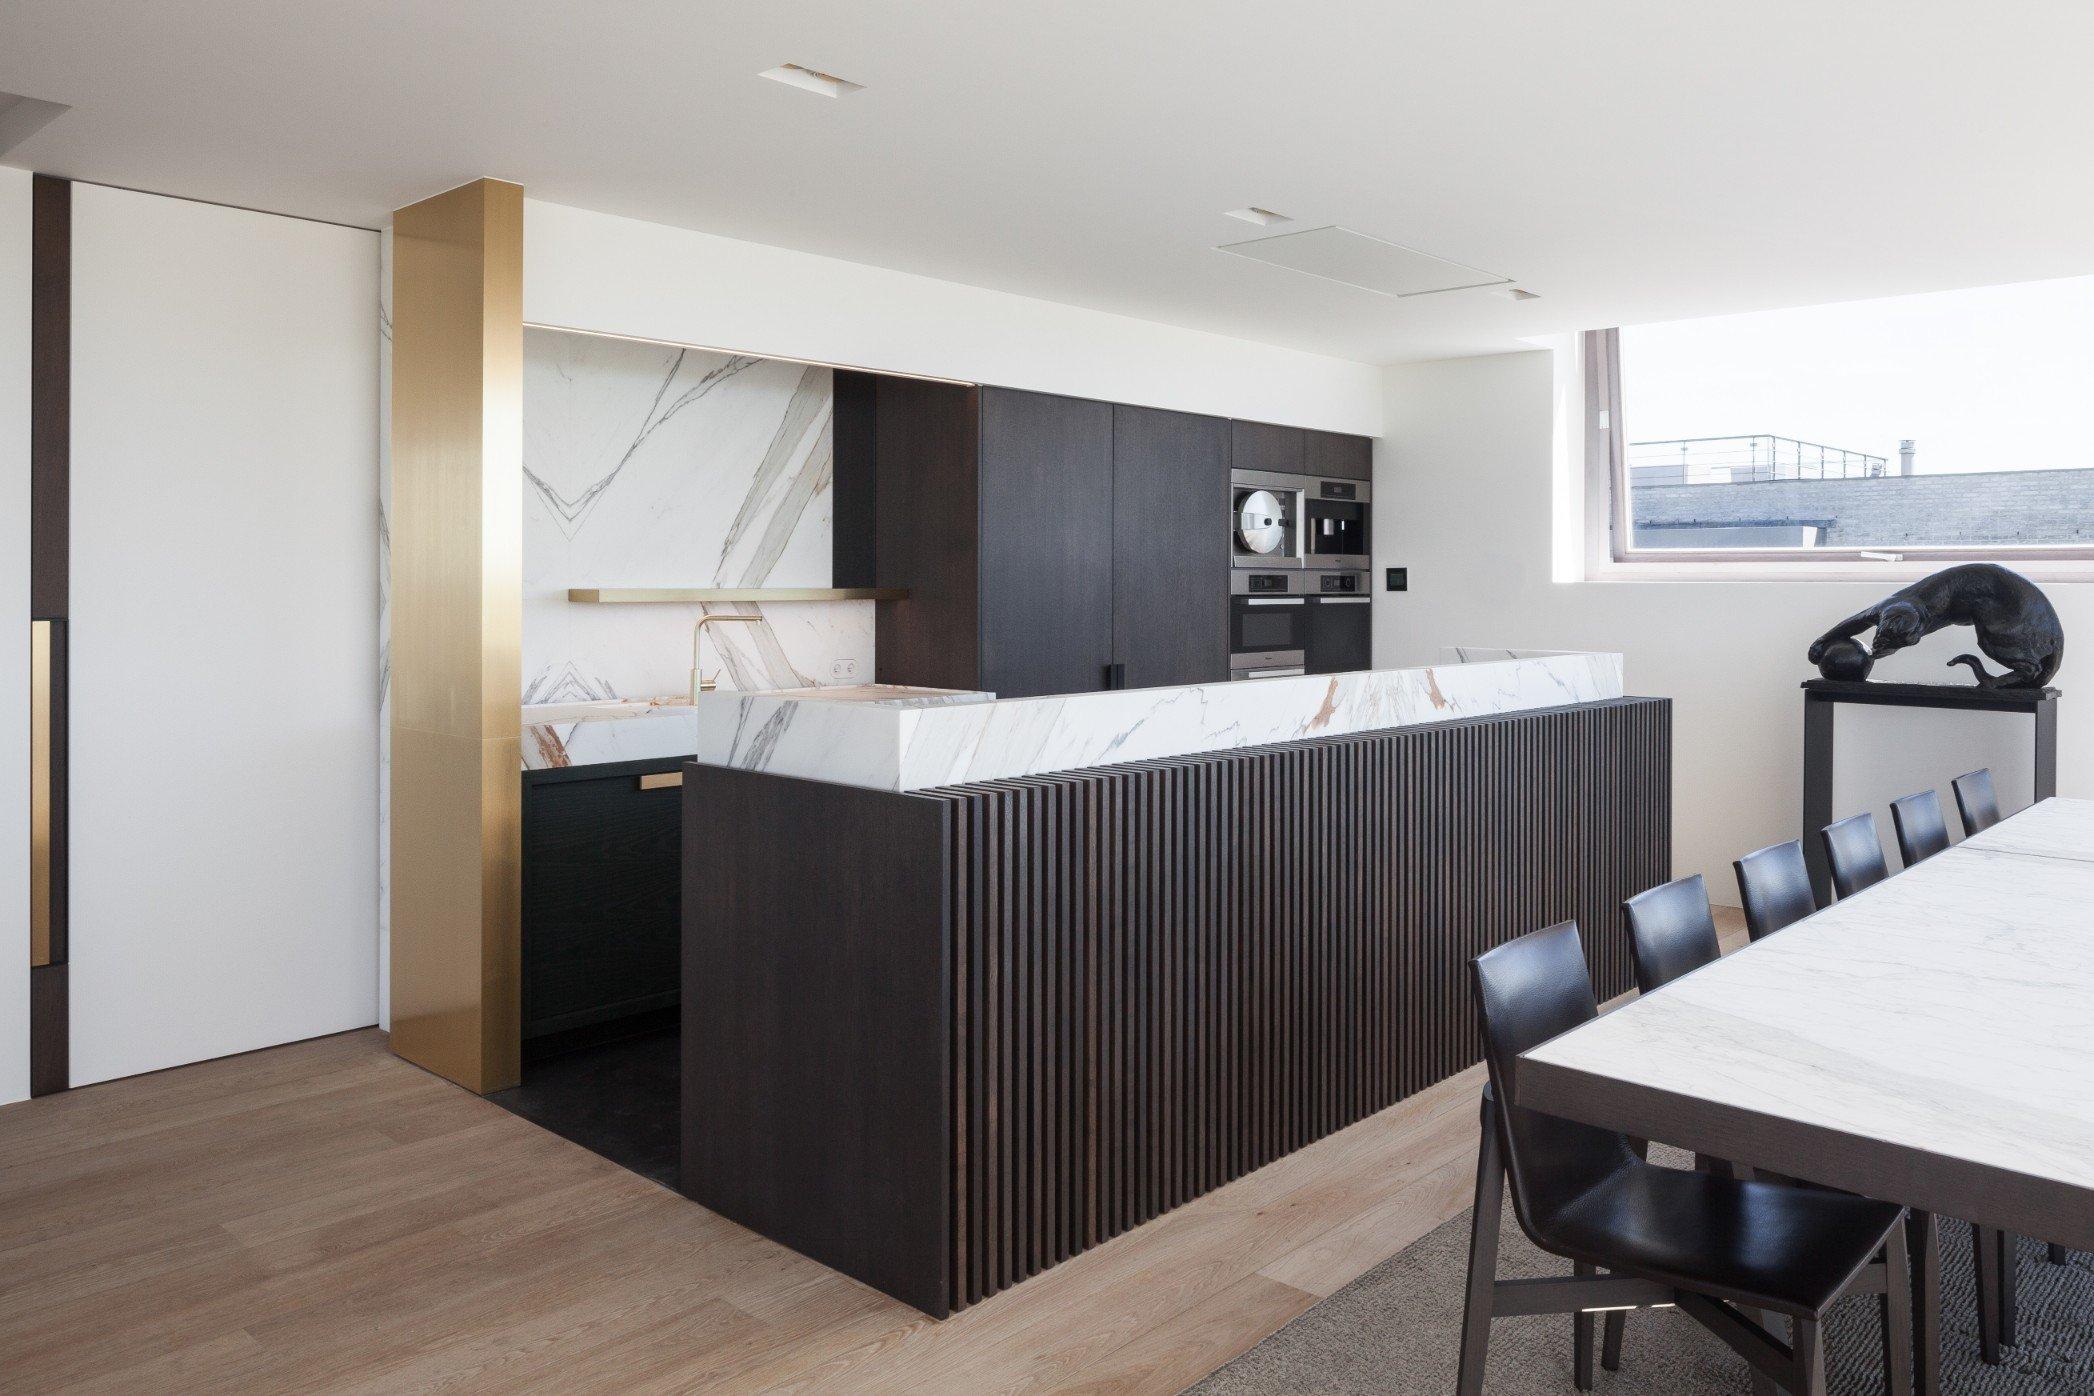 Rietveldprojects-penthouse-appartement-design-architectuur-kust24